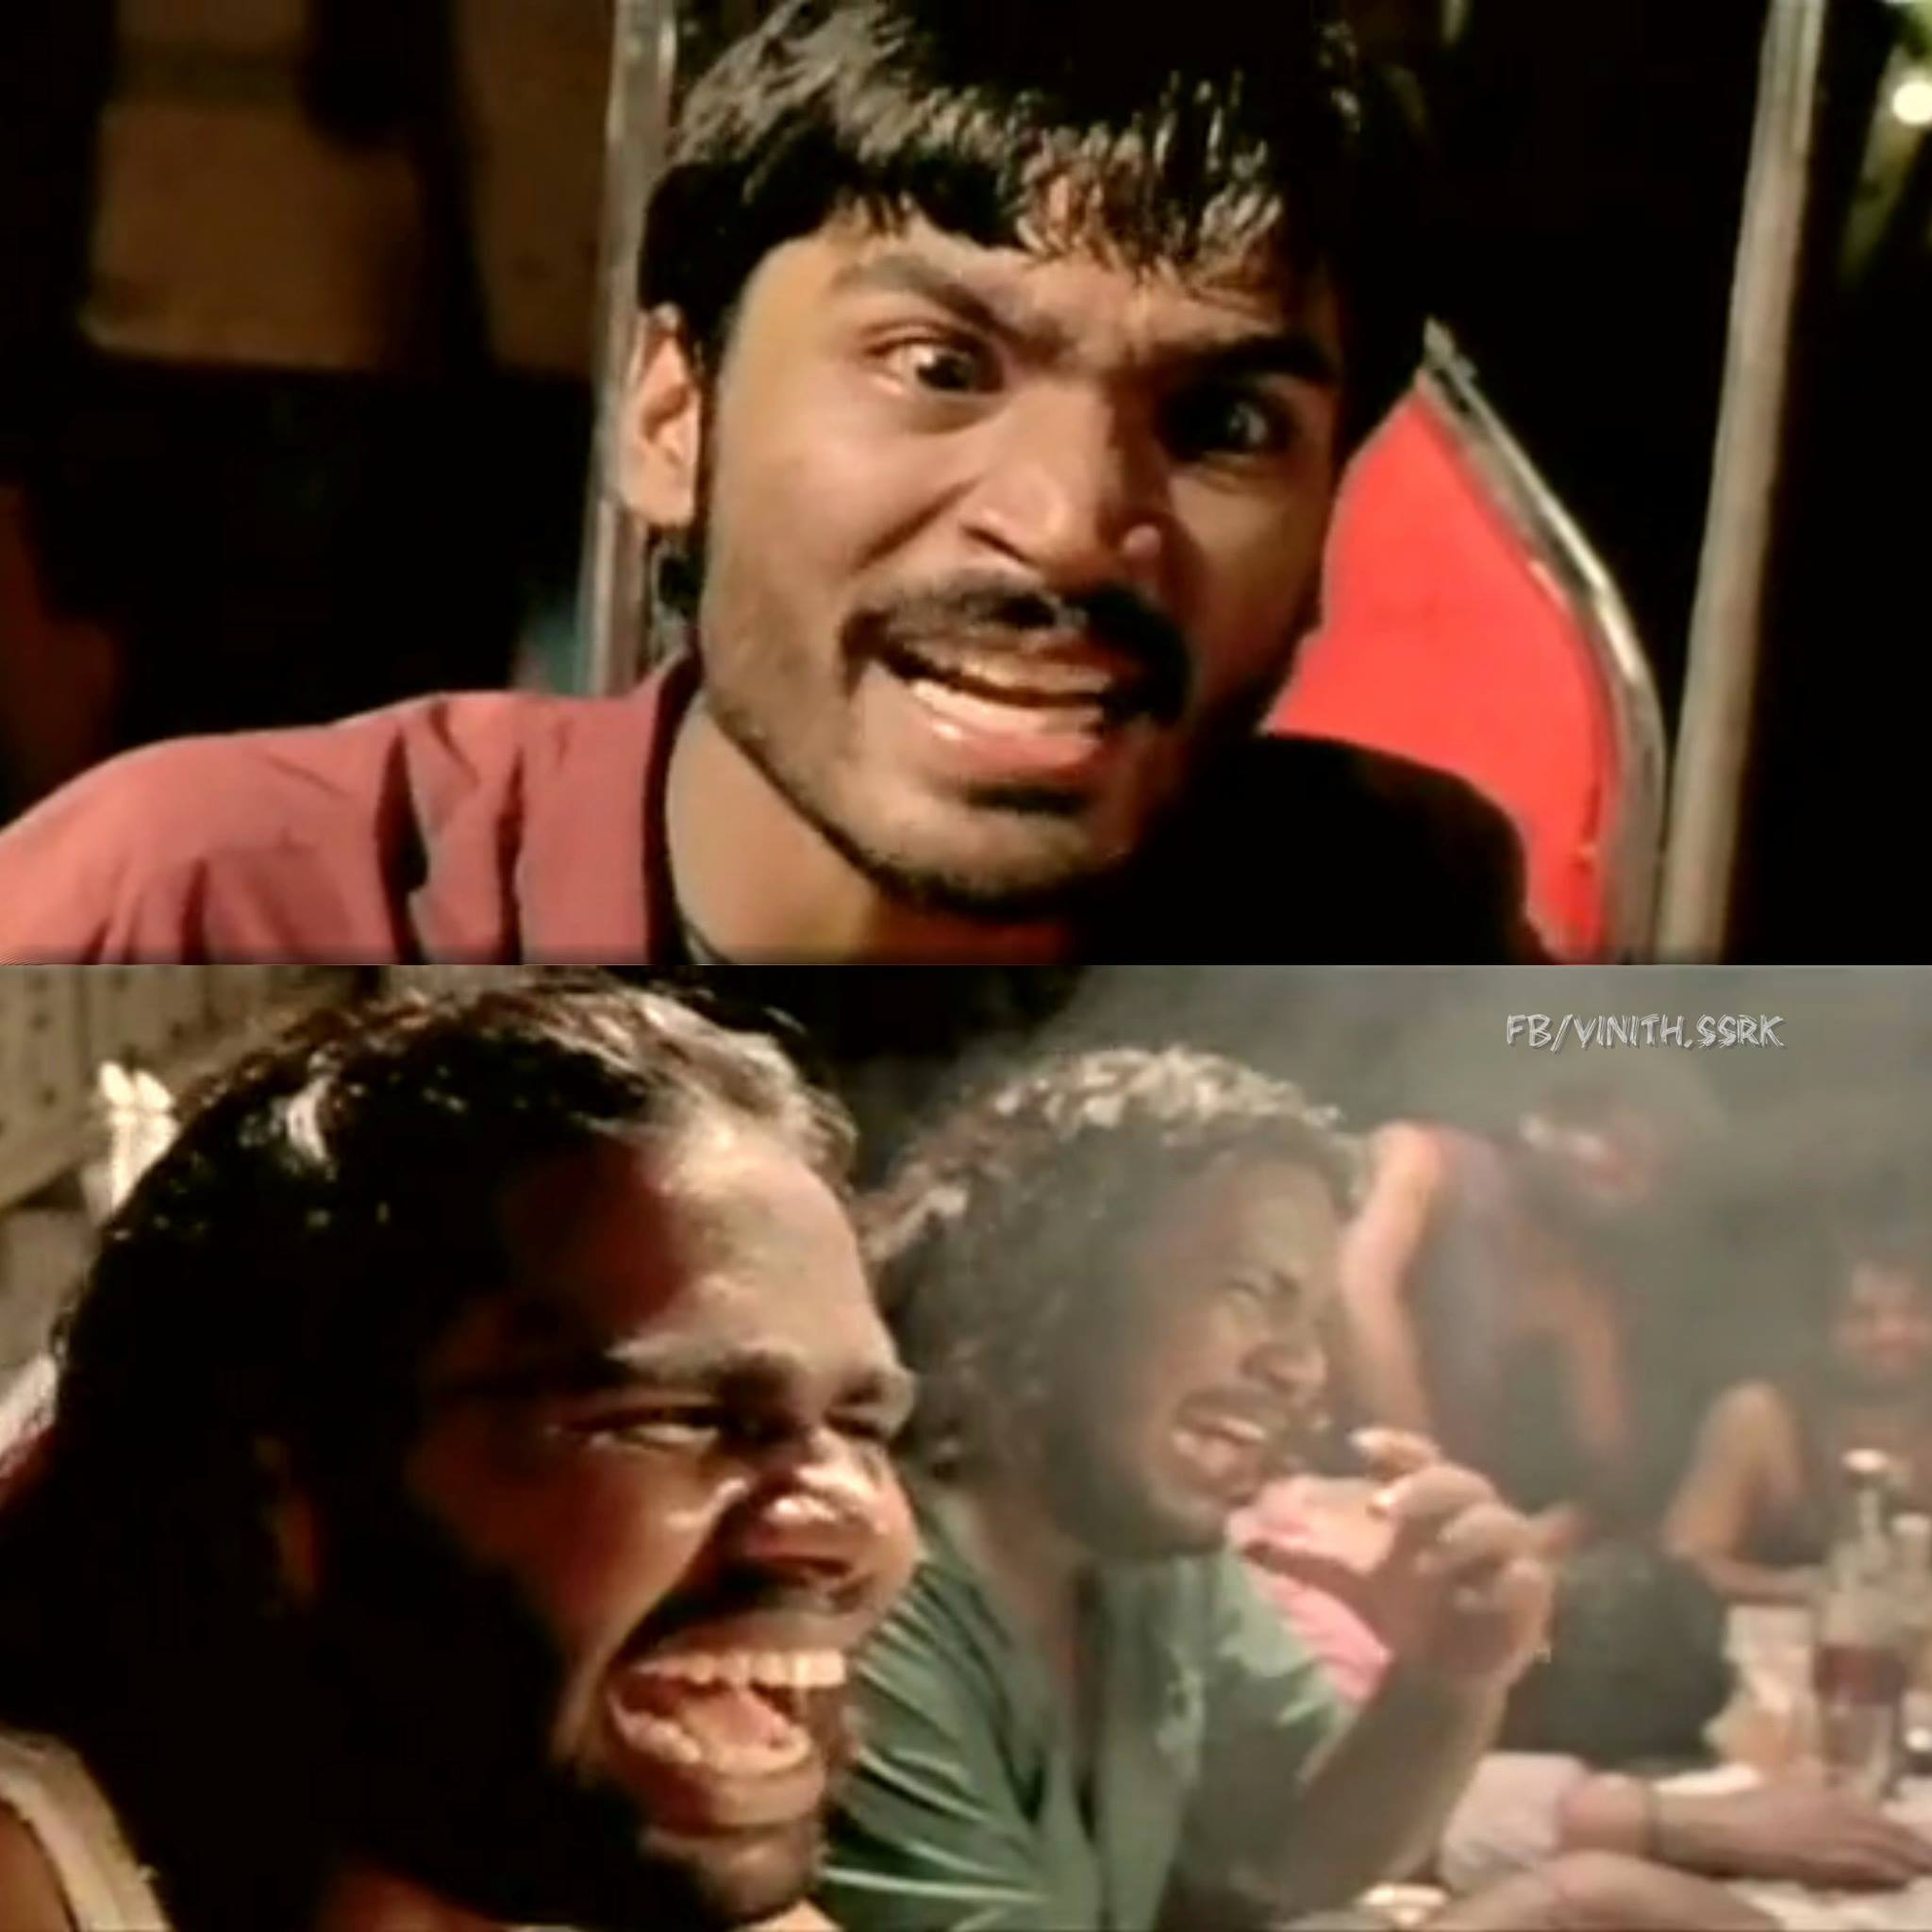 Frequently Used Tamil Meme Templates 3 Kakakapo